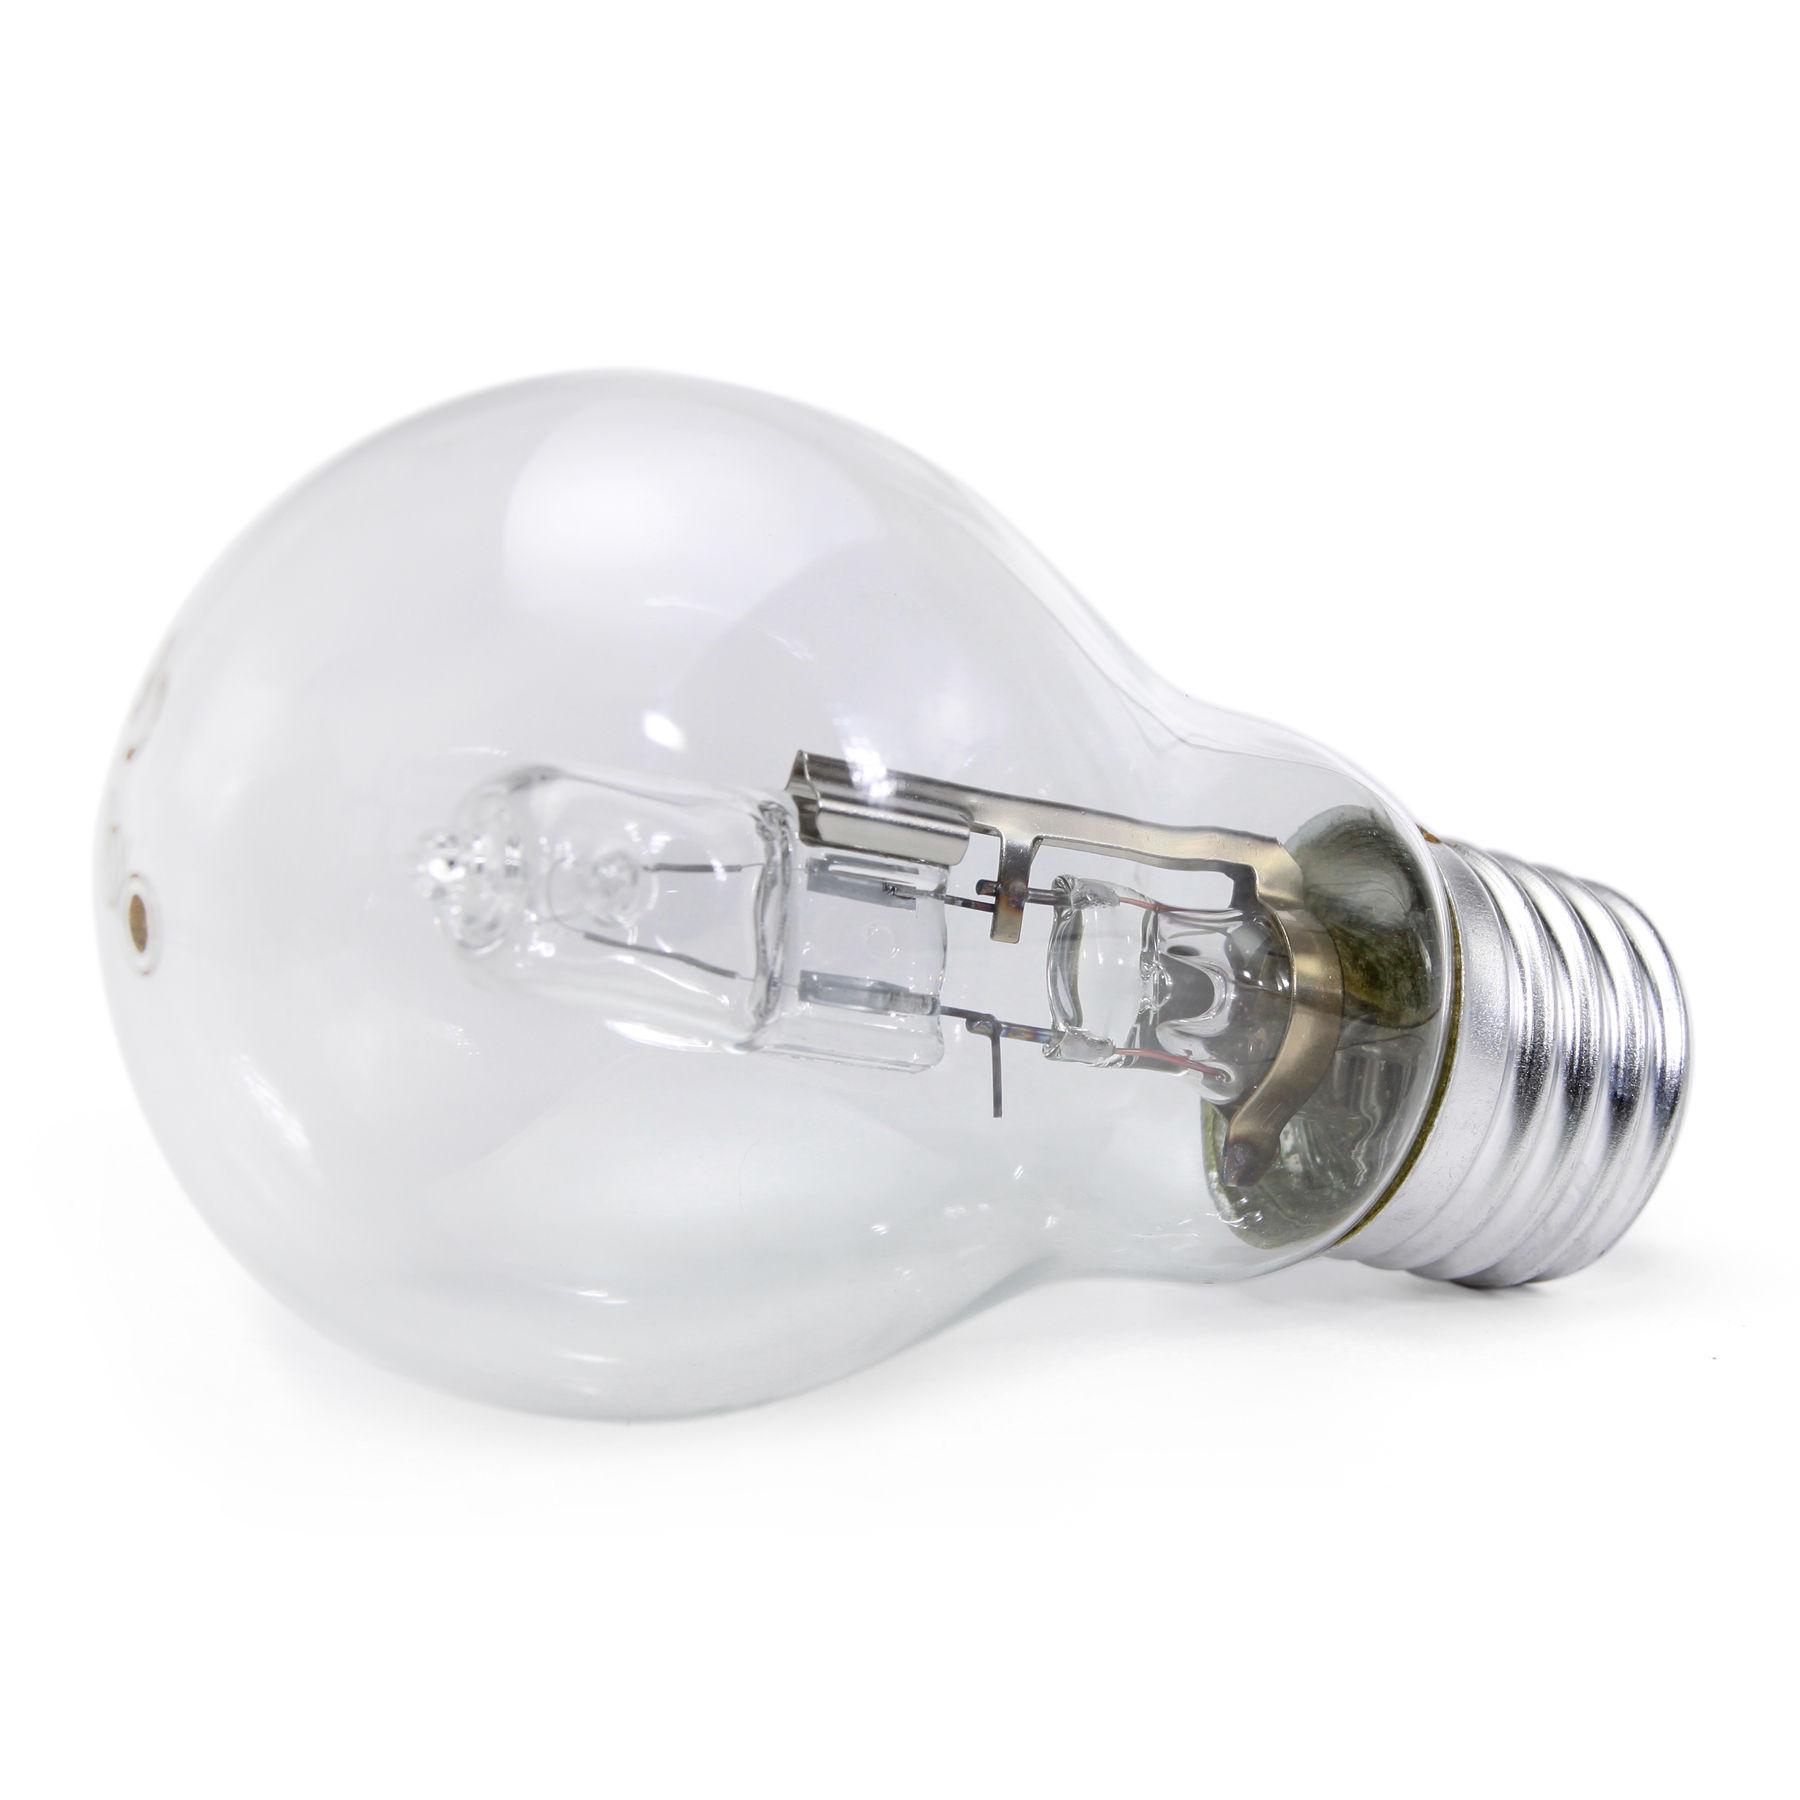 5 x Opus 70W = 100W GLS Es E27 Screw Cap Long Life Clear Eco Halogen Light Bulb Dimmable Energy Saving Lamp